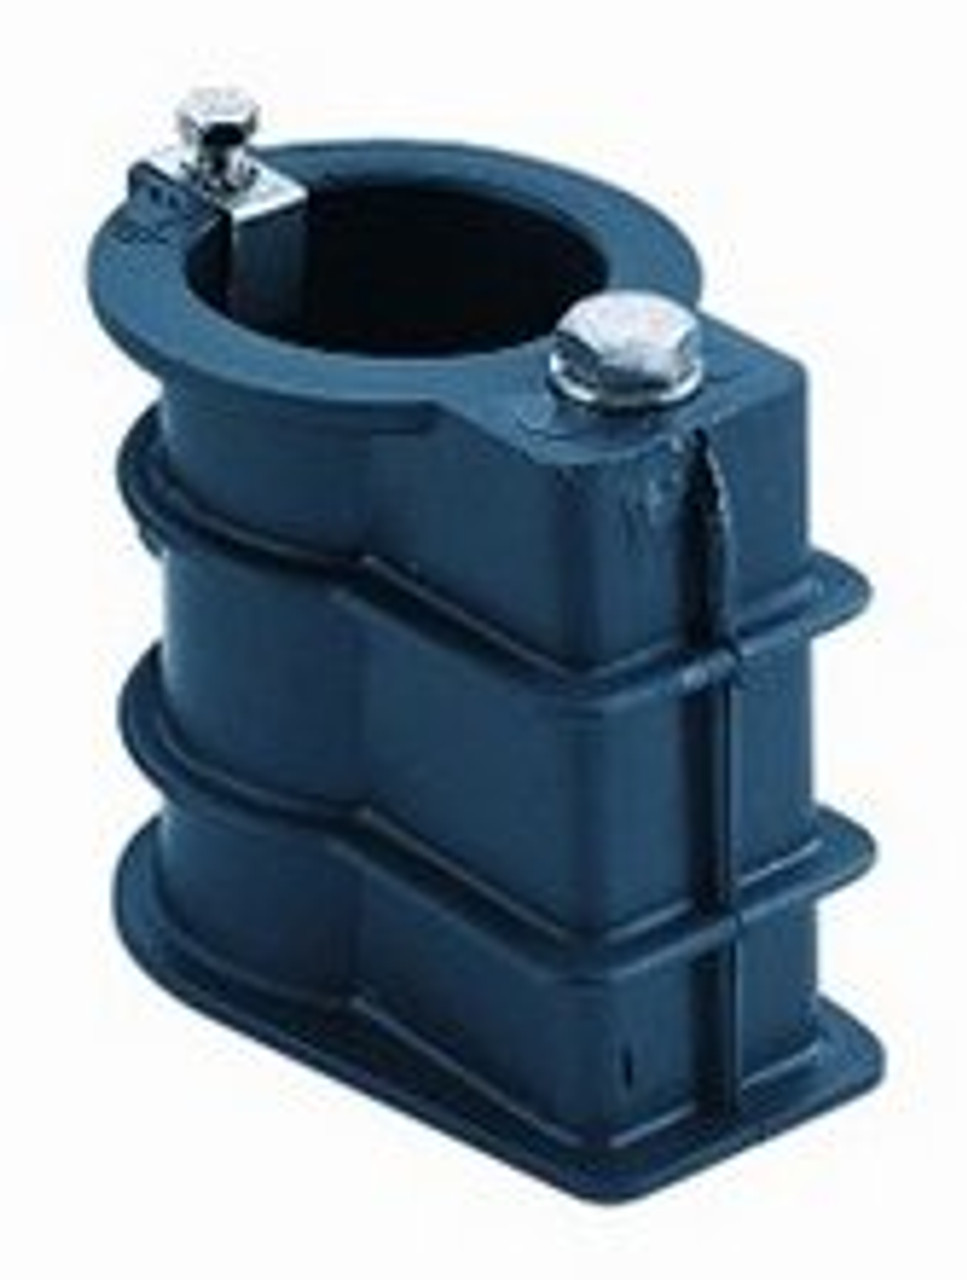 Astral Swimming Pool Ladder and Rail Anchor Kit for 43mm Diameter Tube